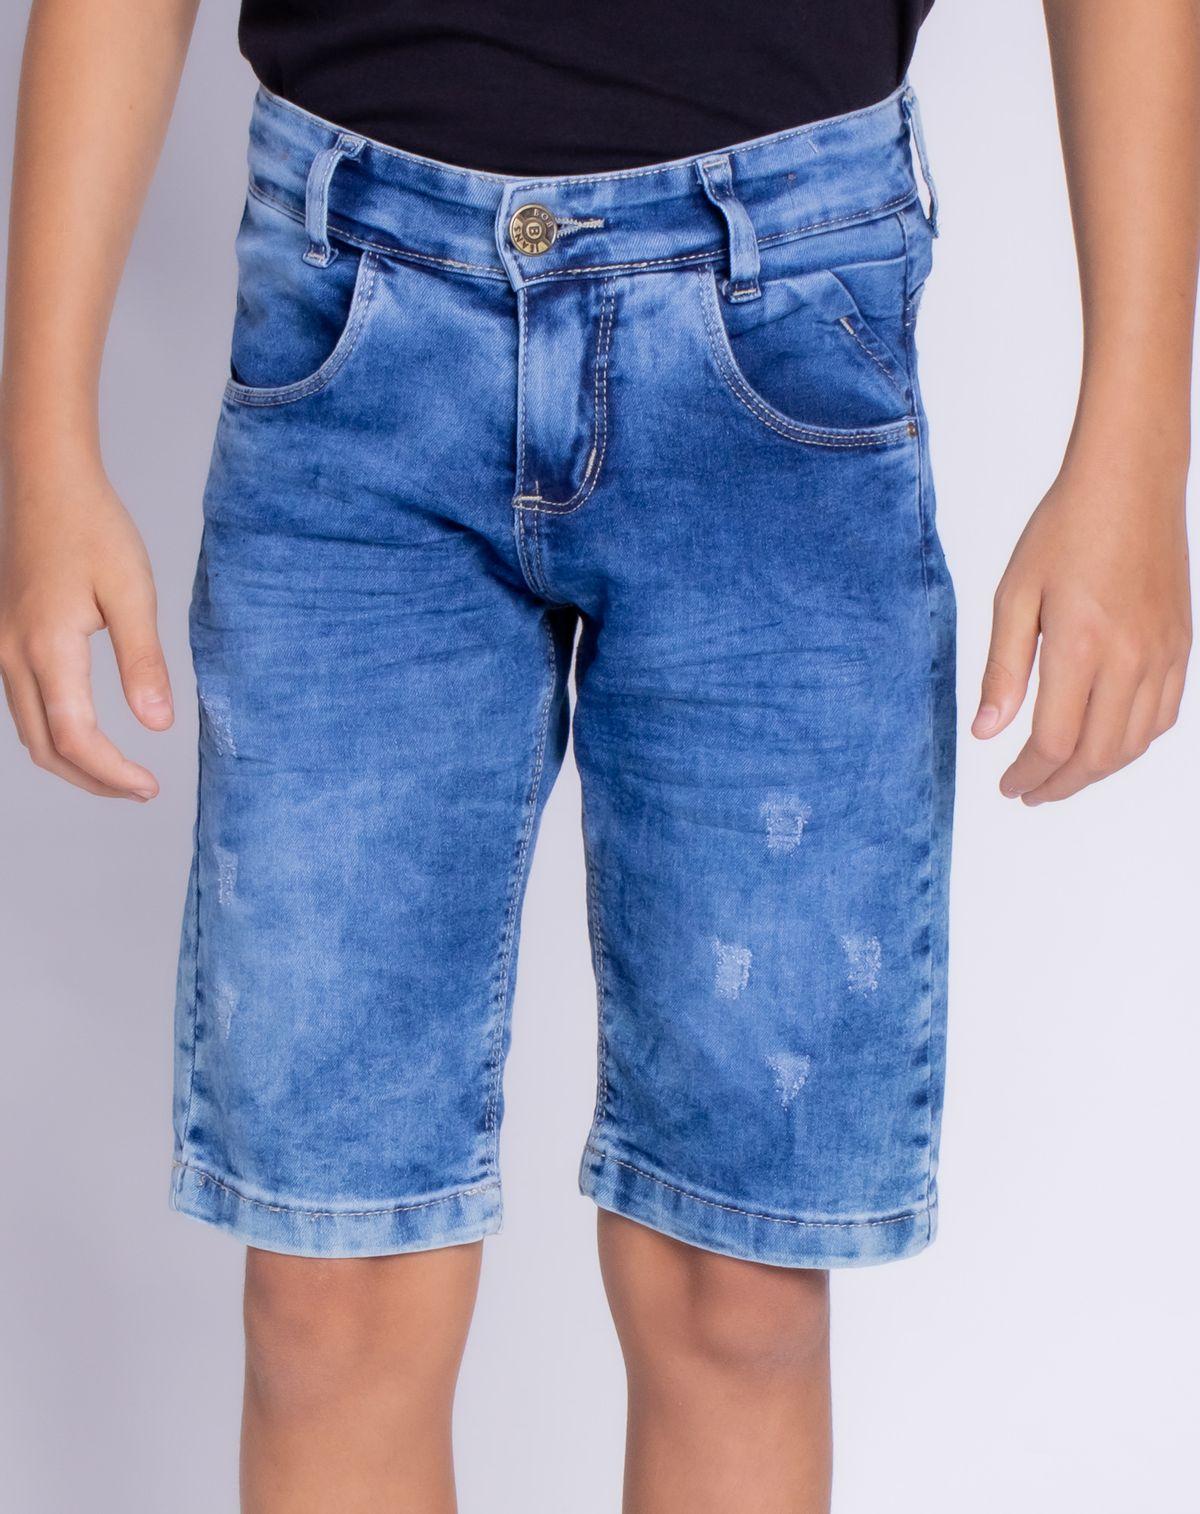 600190002-bermuda-jeans-juvenil-bolsos-marmorizada-jeans-12-139